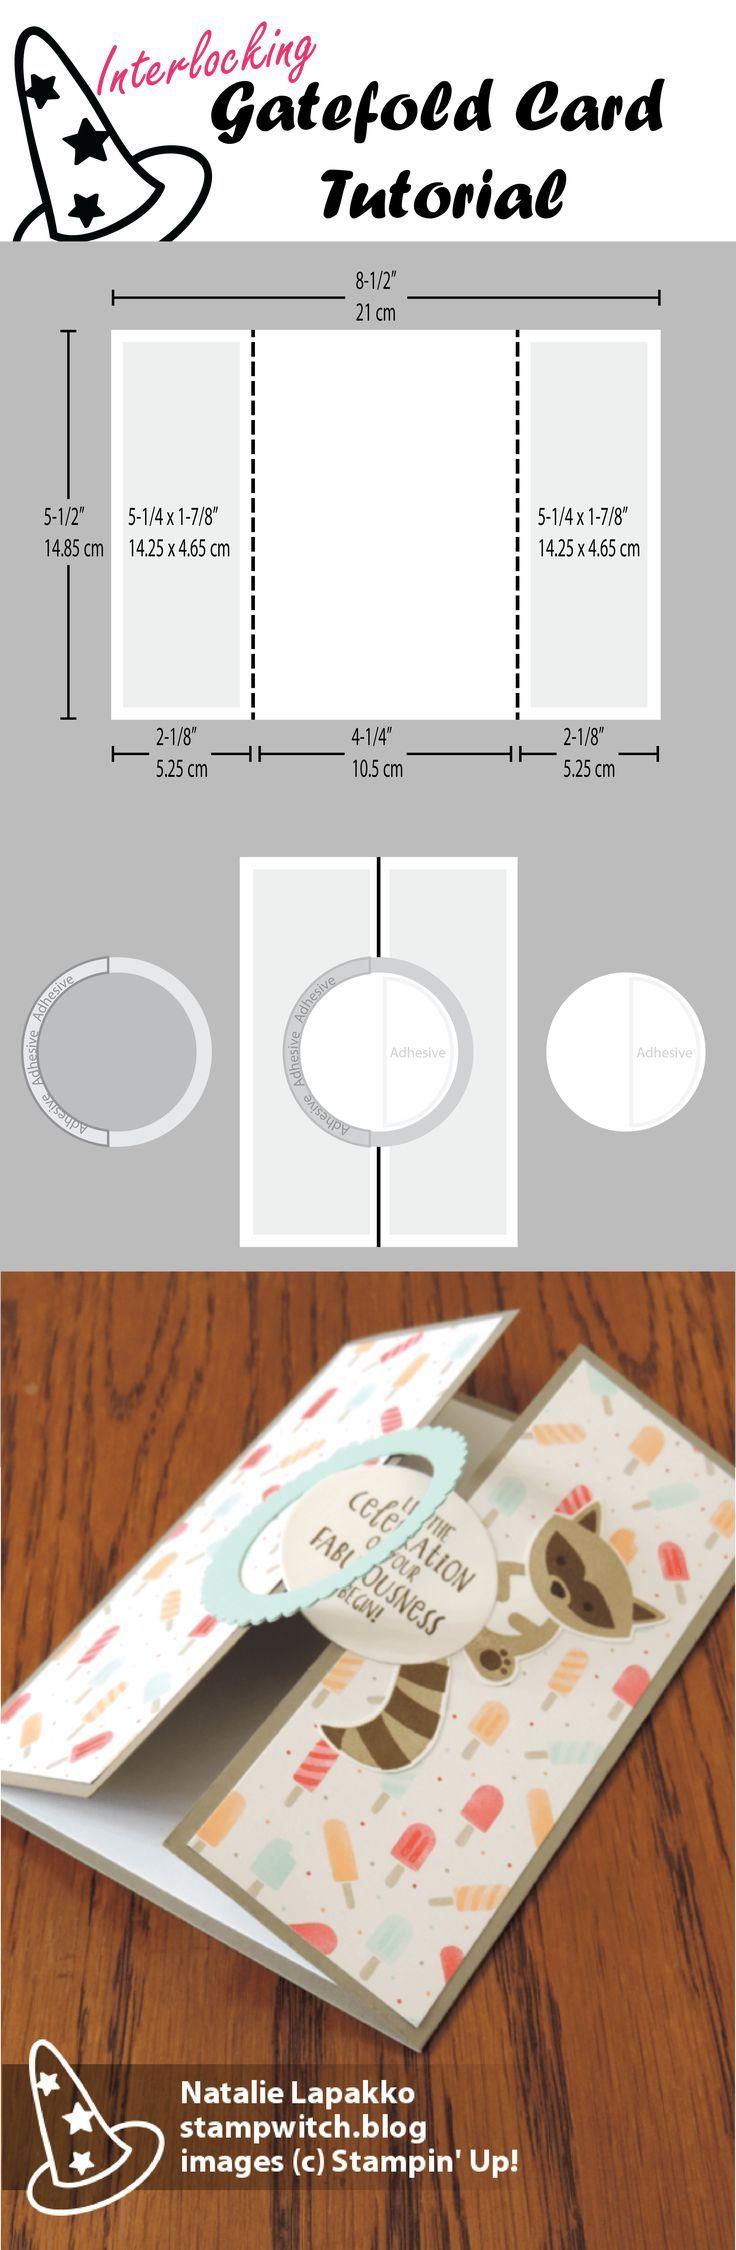 Gatefold Card Variations